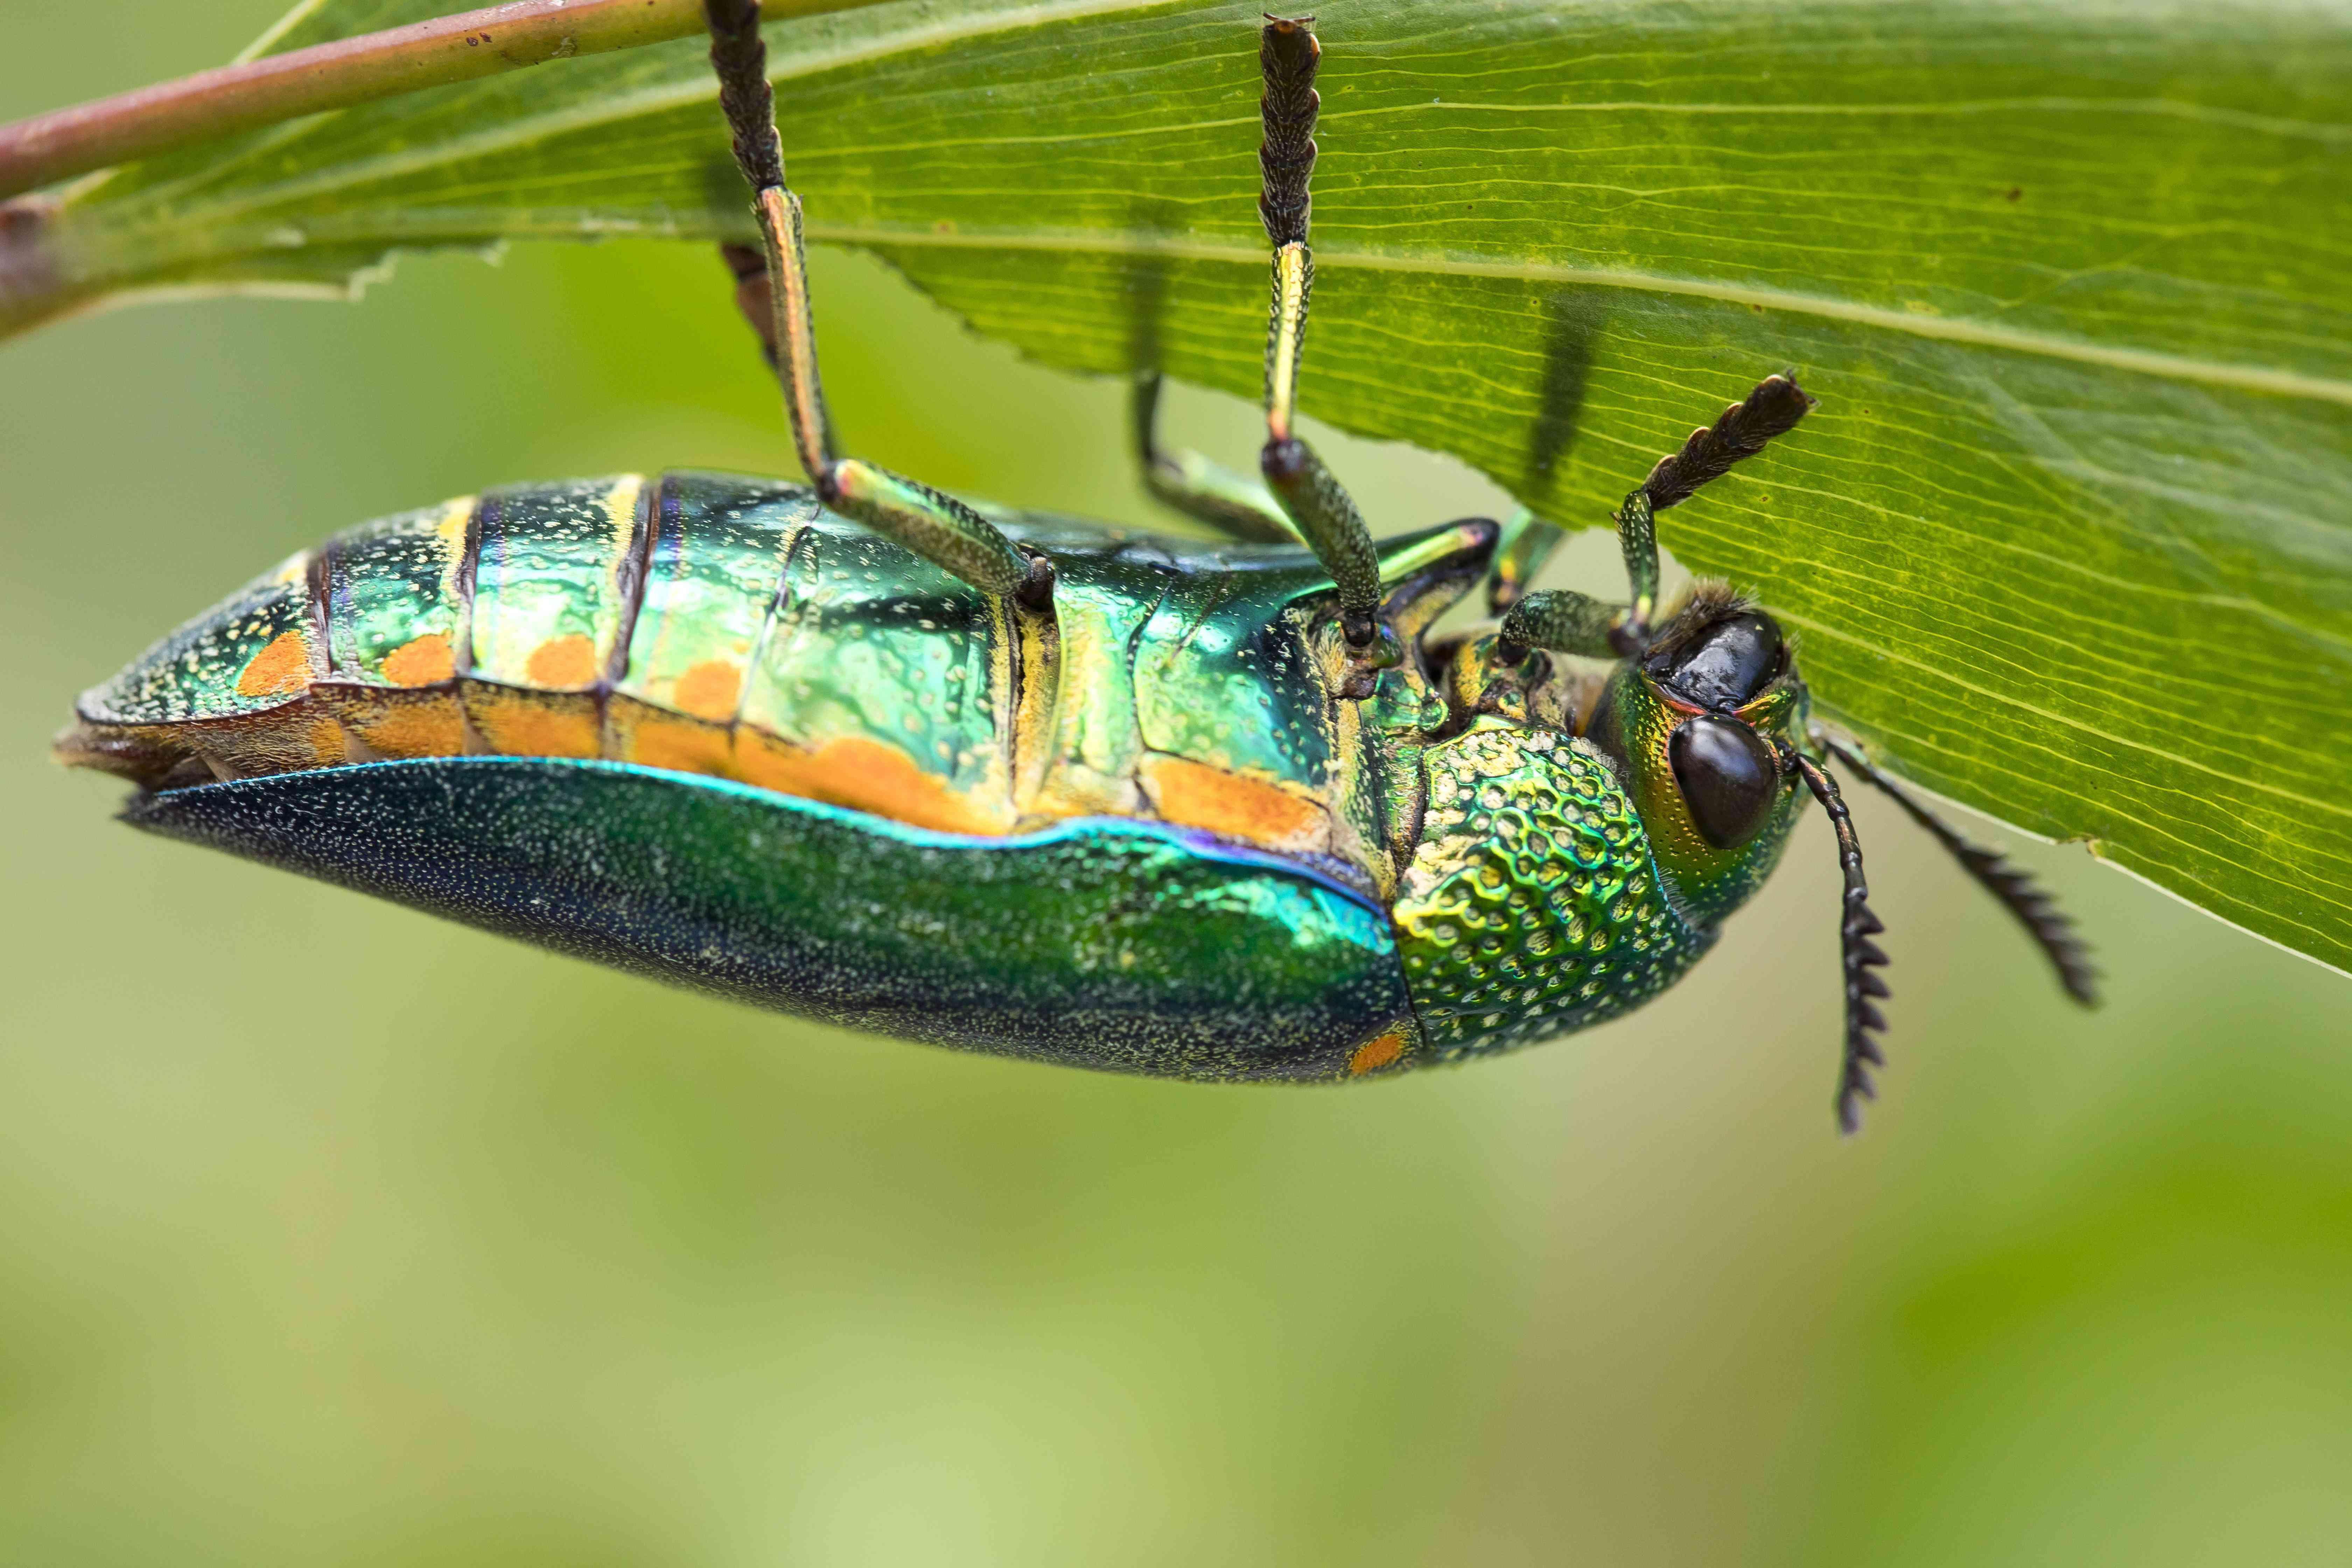 Jewel beetle upside down, eating a leaf